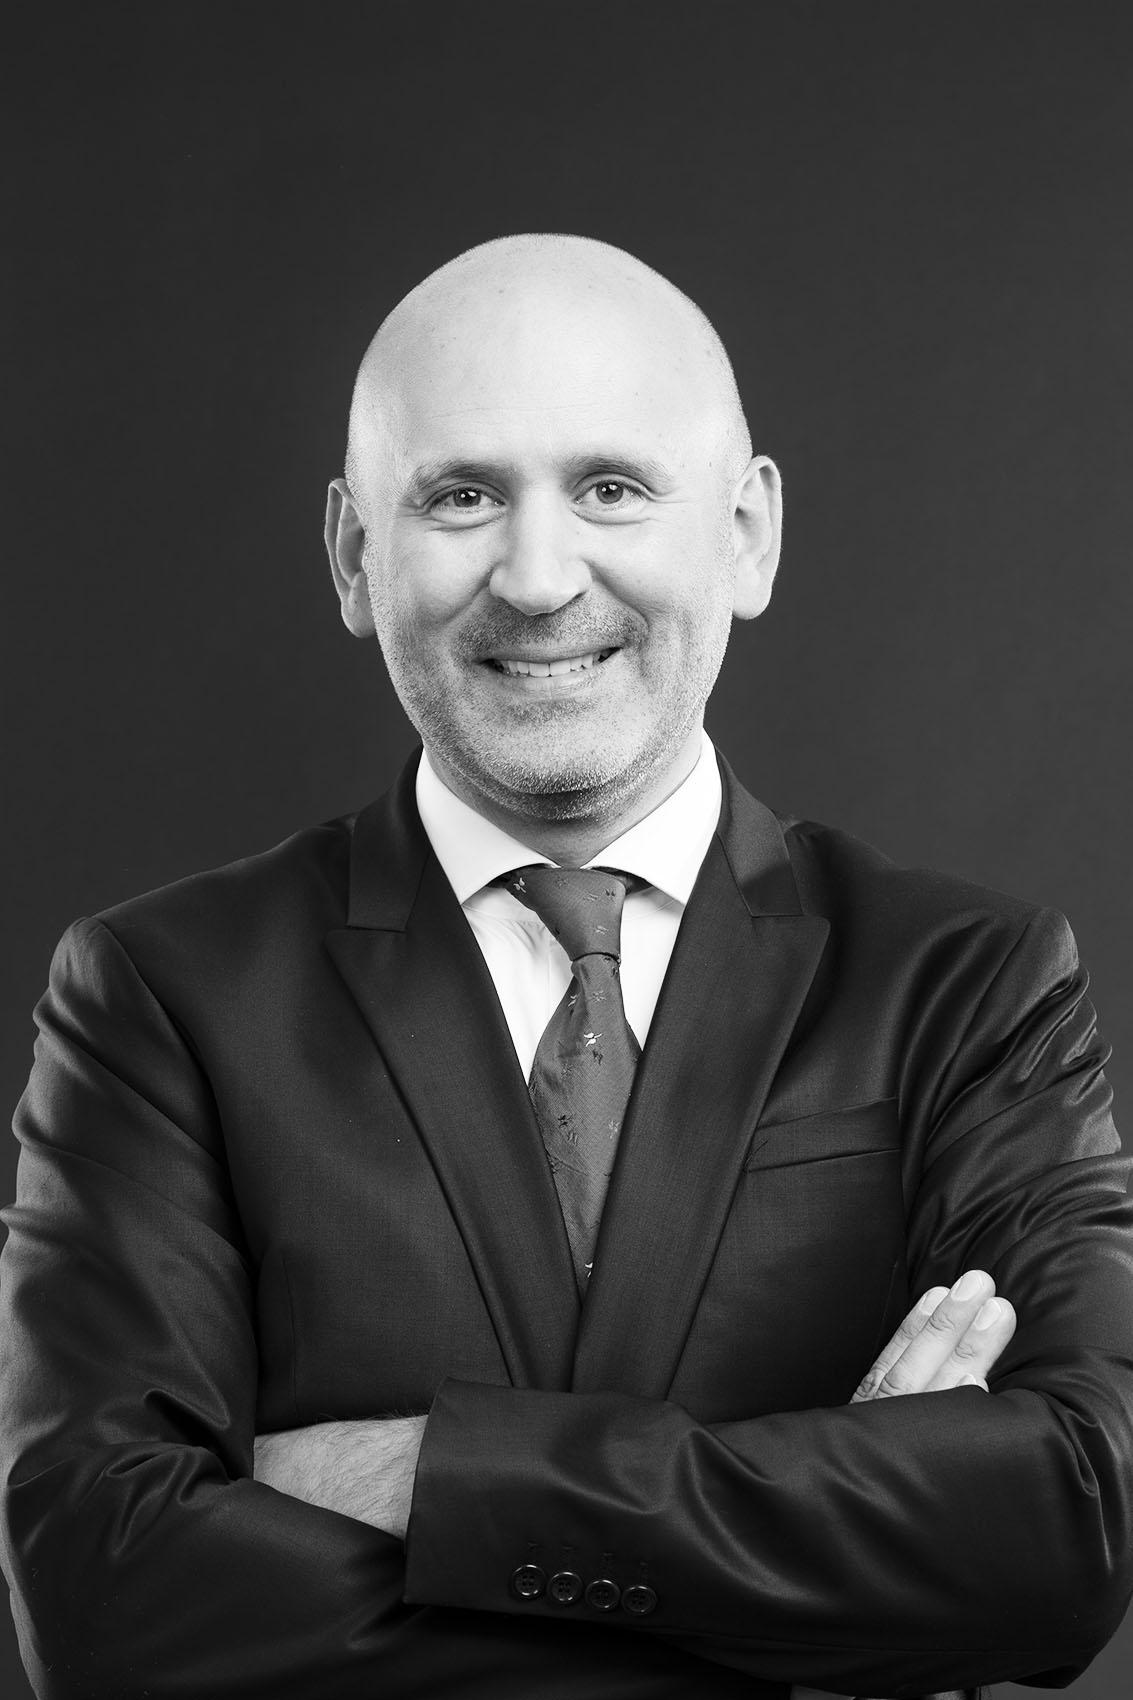 Thomas Perri